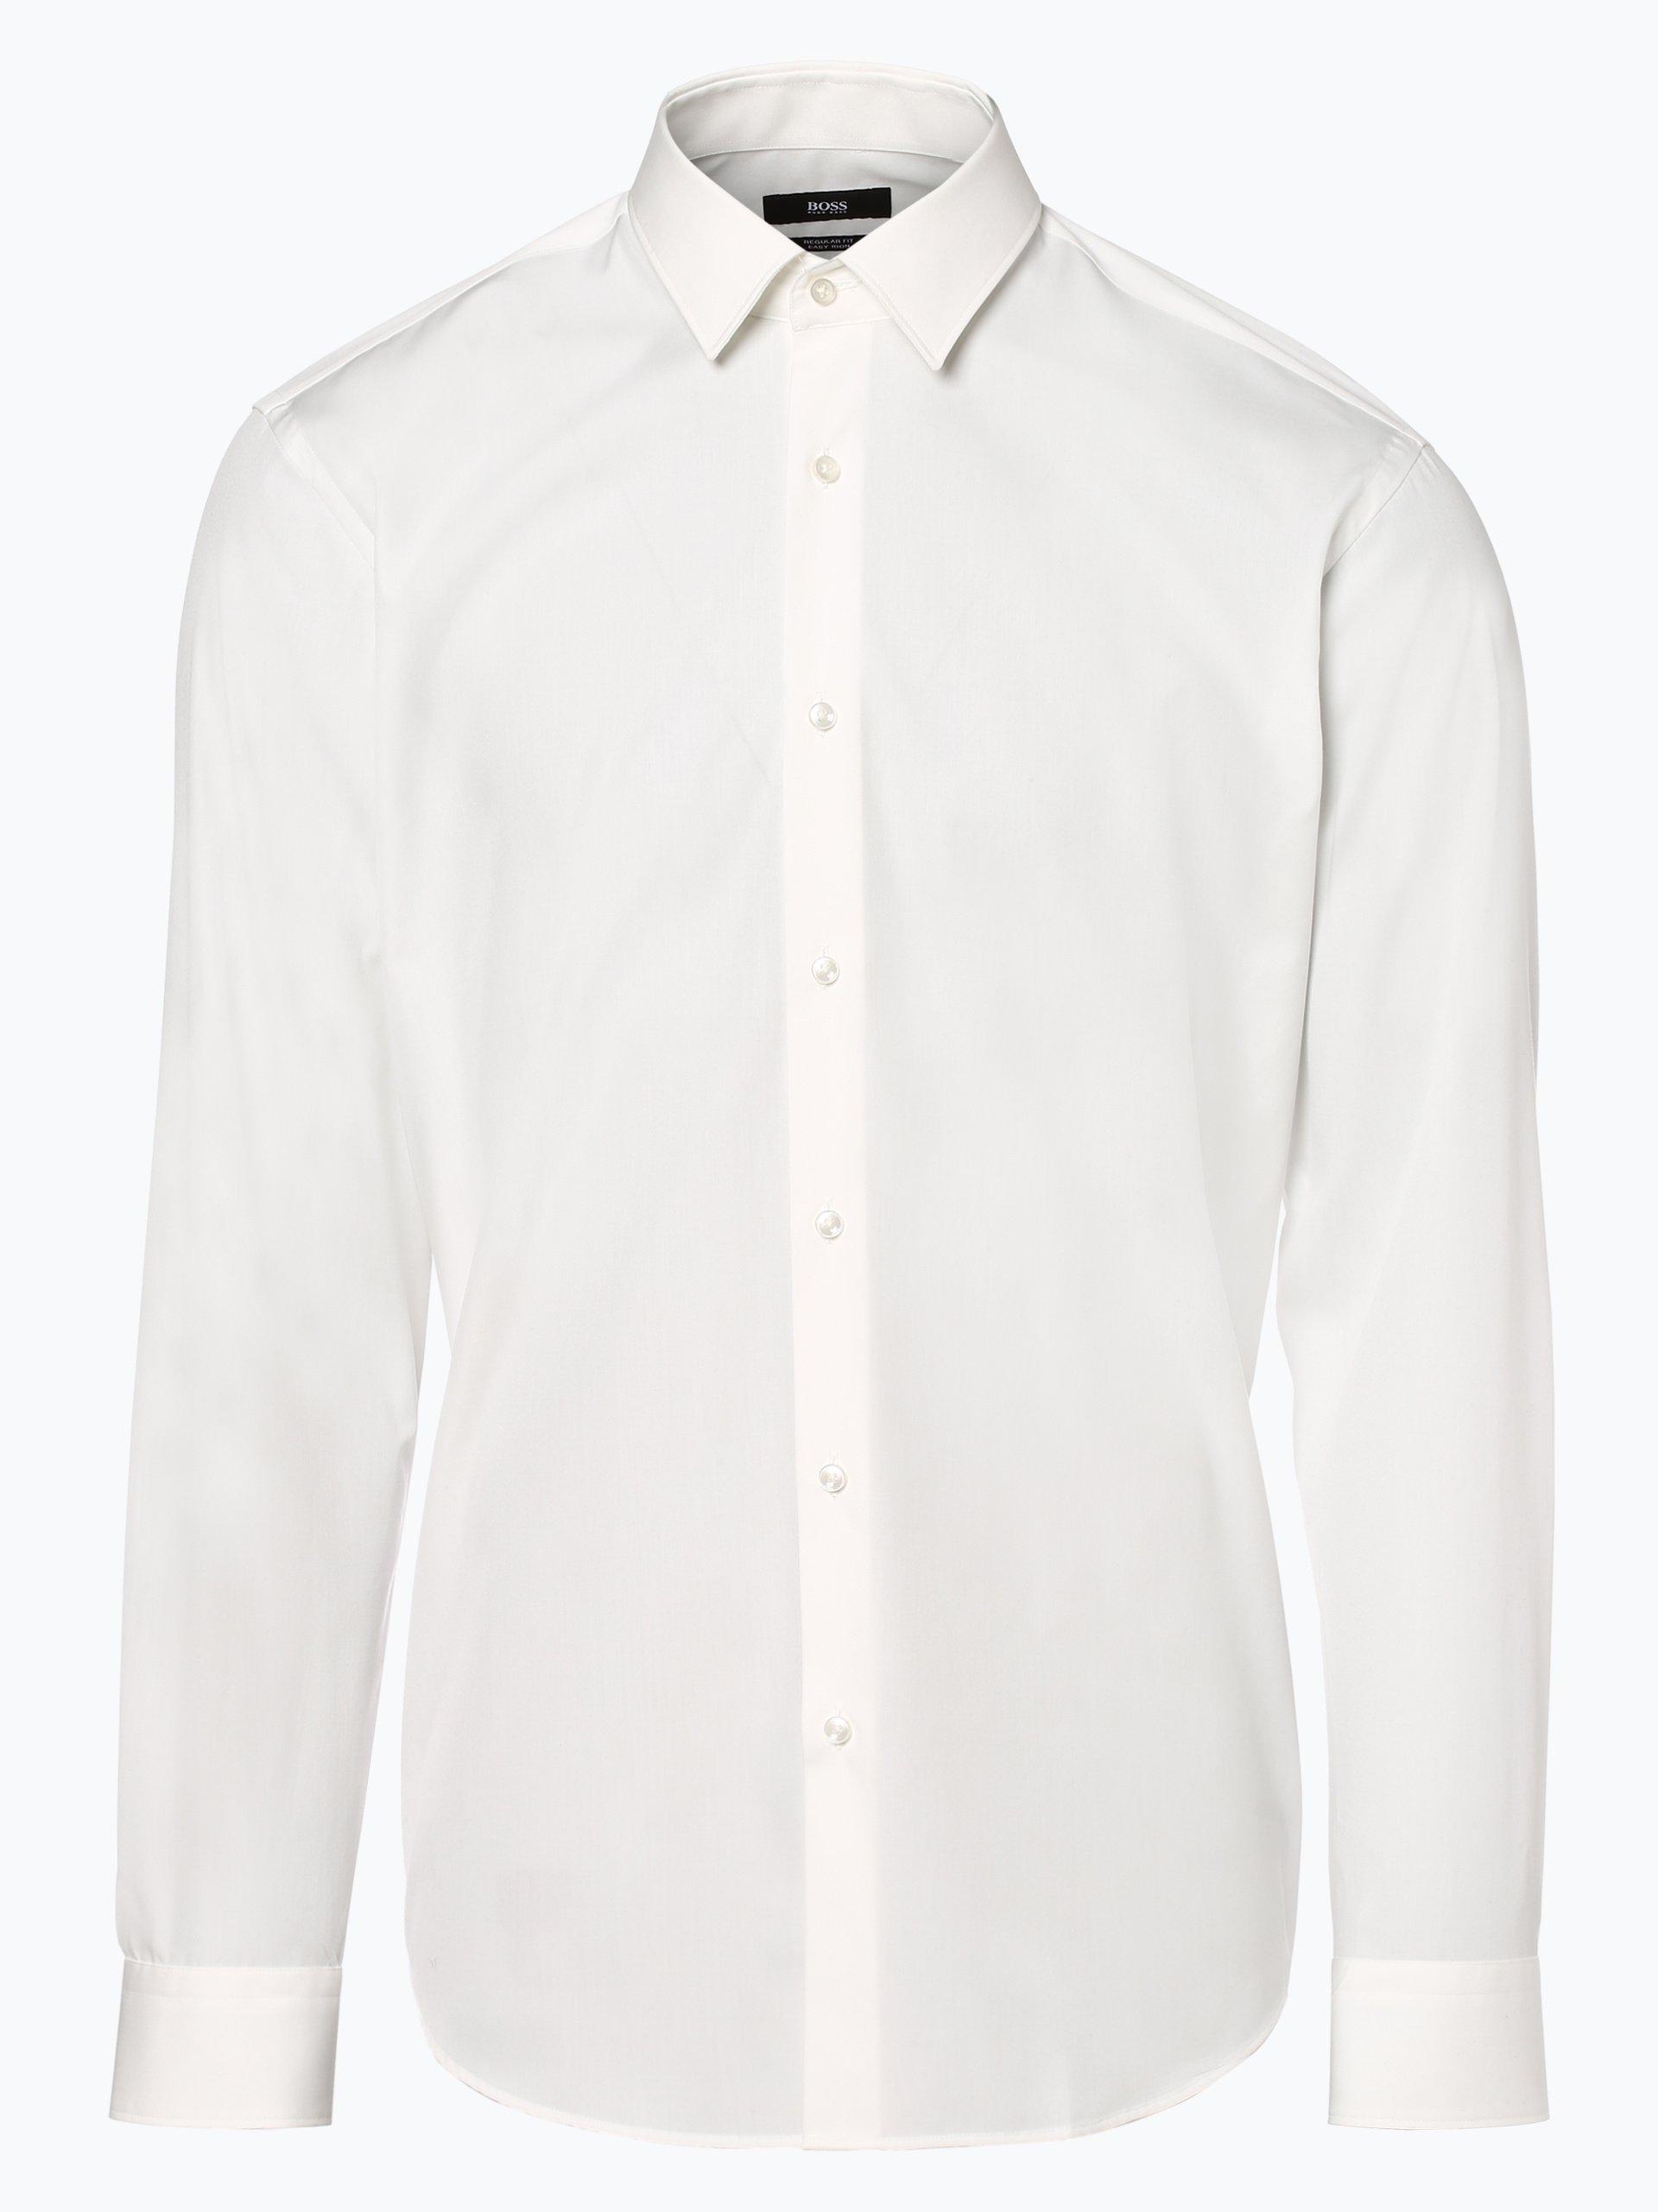 BOSS Herren Hemd - Bügelleicht - Eliott